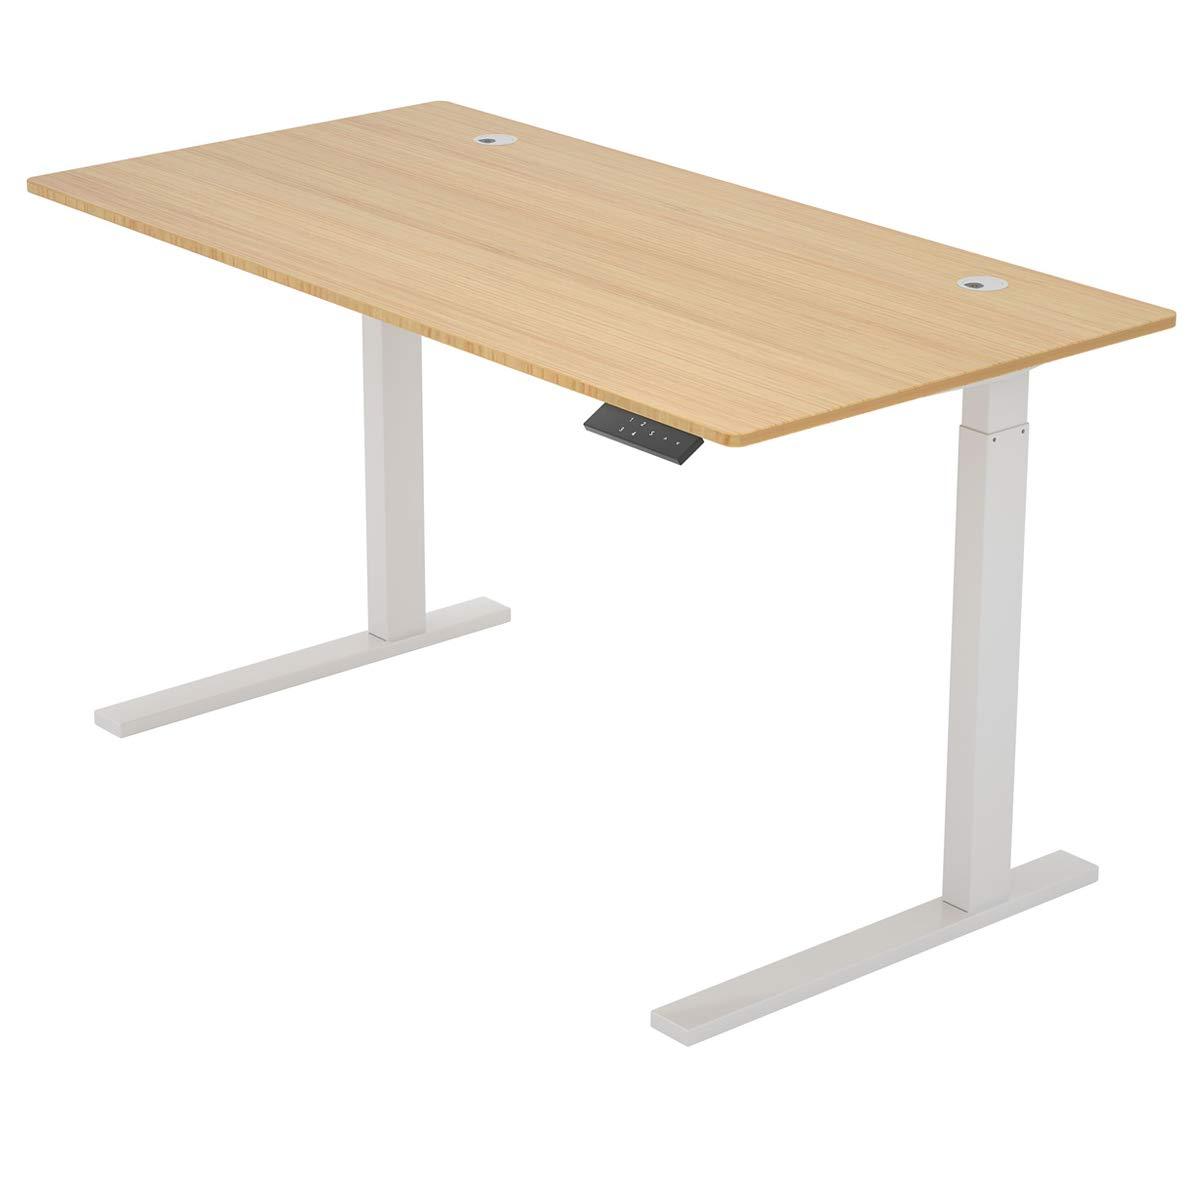 "ZHU CHUANG Height Adjustable Desk Electric Standing Desk Stand up Desk Home Office Desk Dual Motor Natural Color 100% Solid Bamboo (72"" Rectangle, Desktop and Frame)"